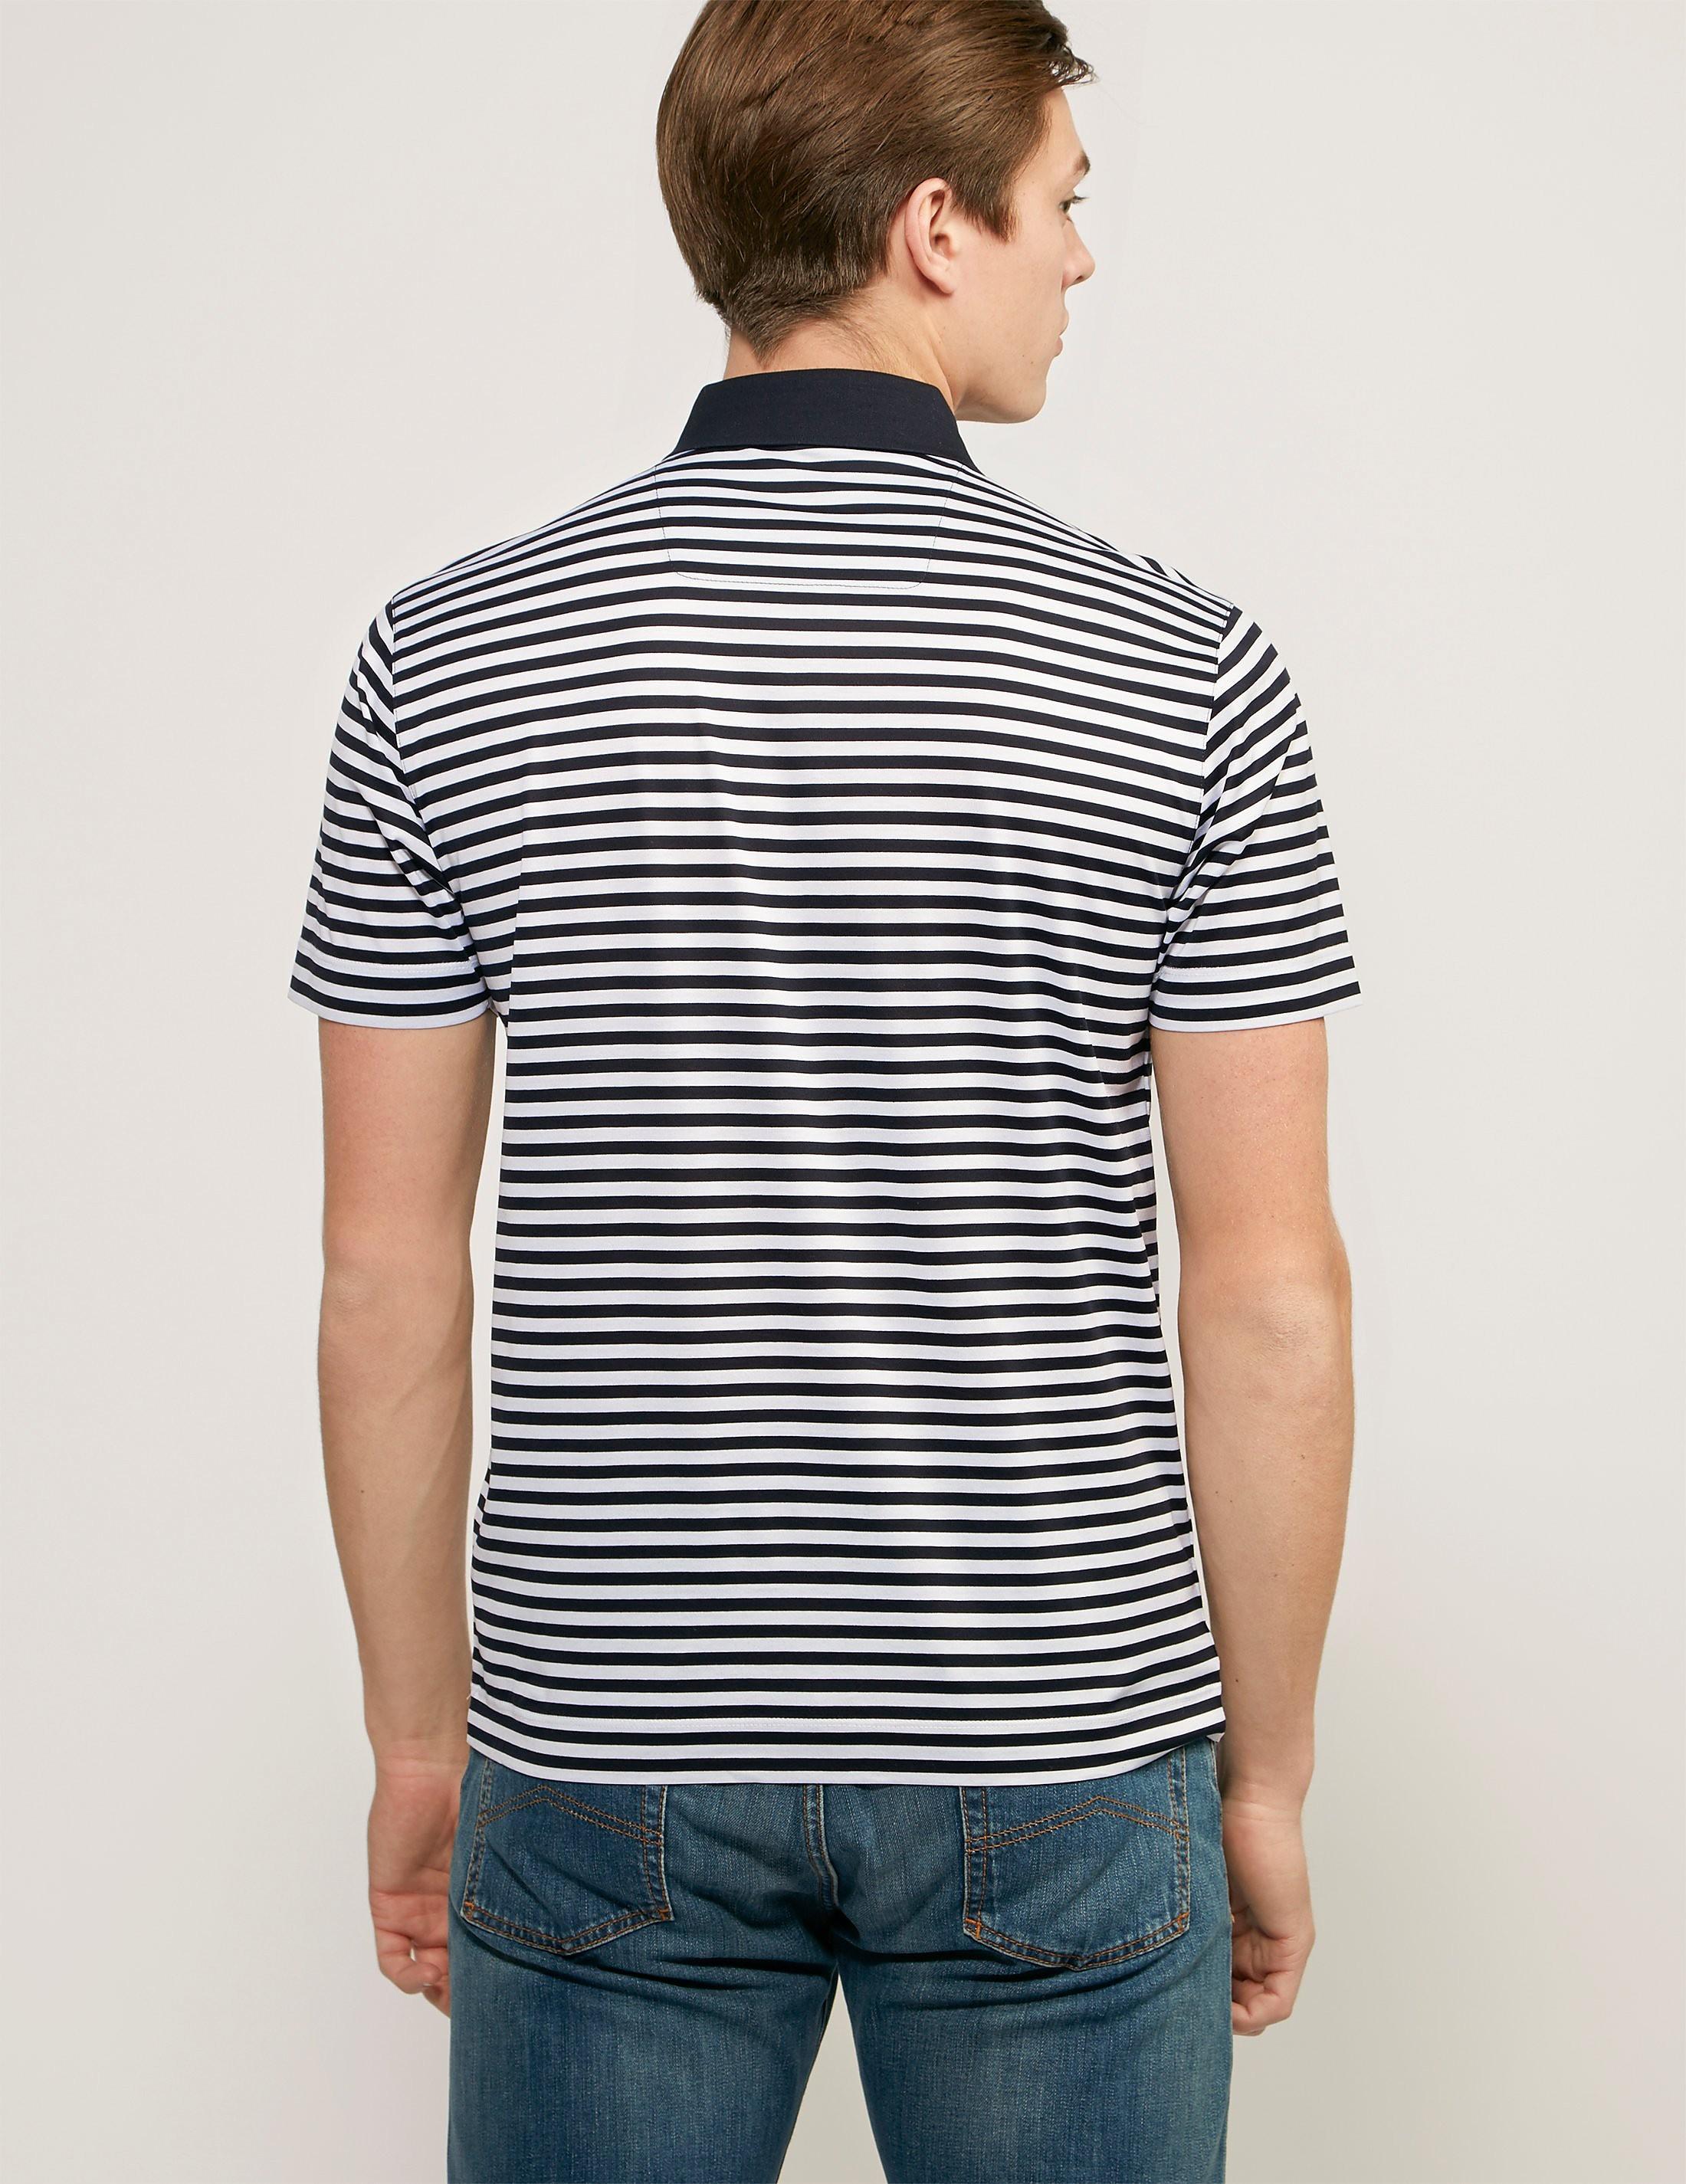 Z Zegna Striped Polo Shirt